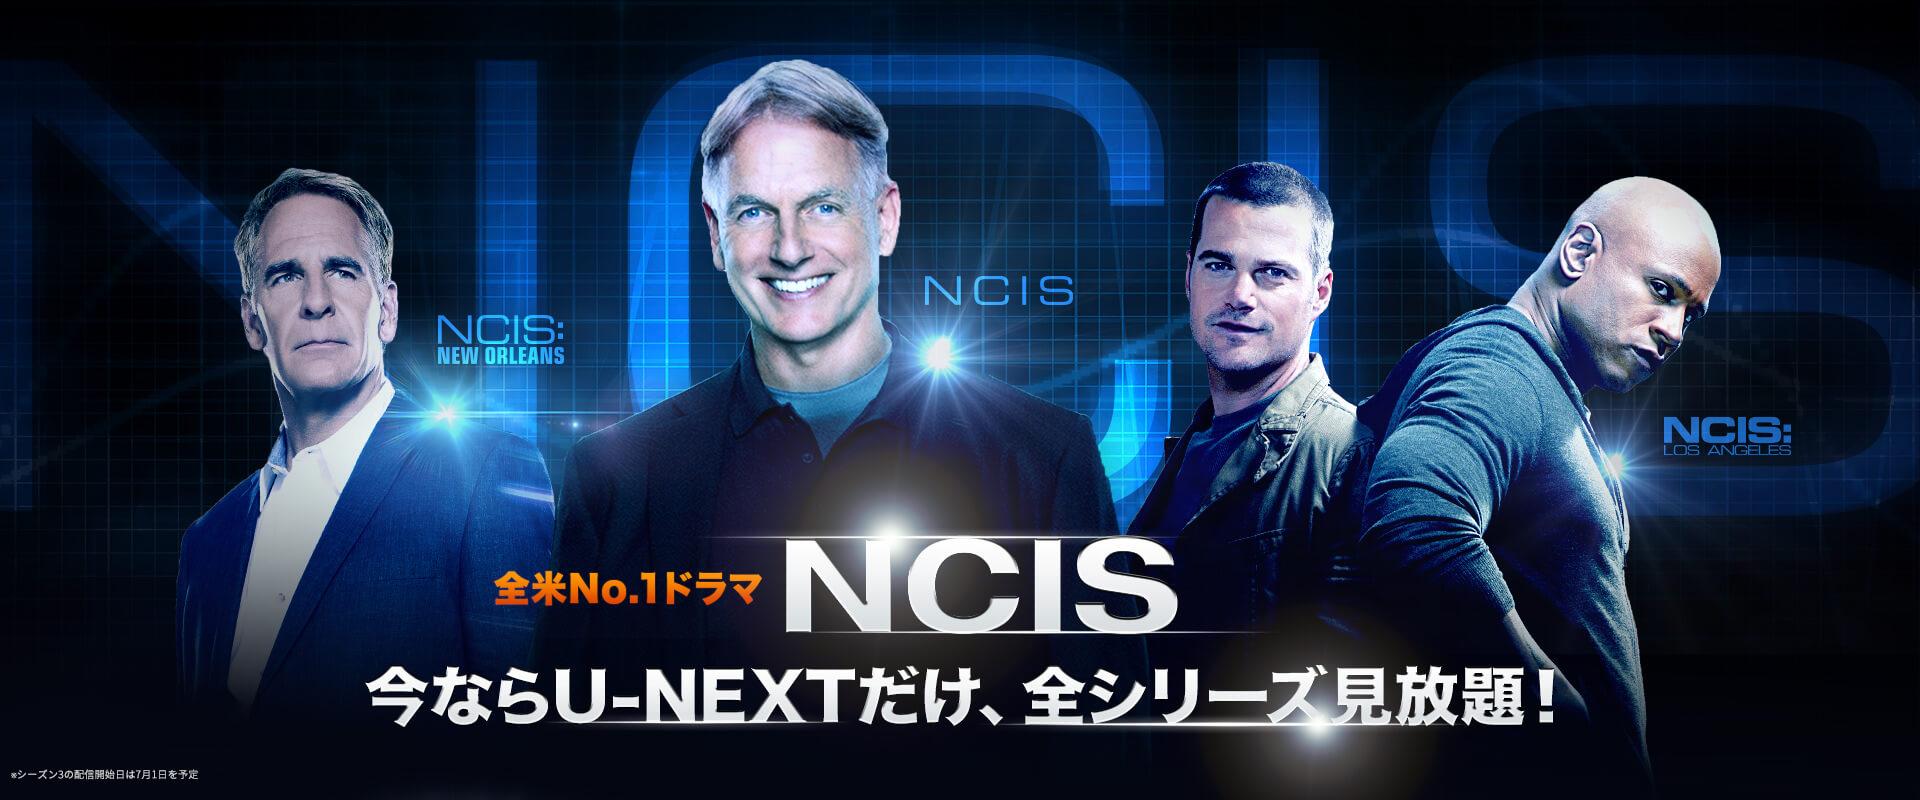 NCISシリーズ